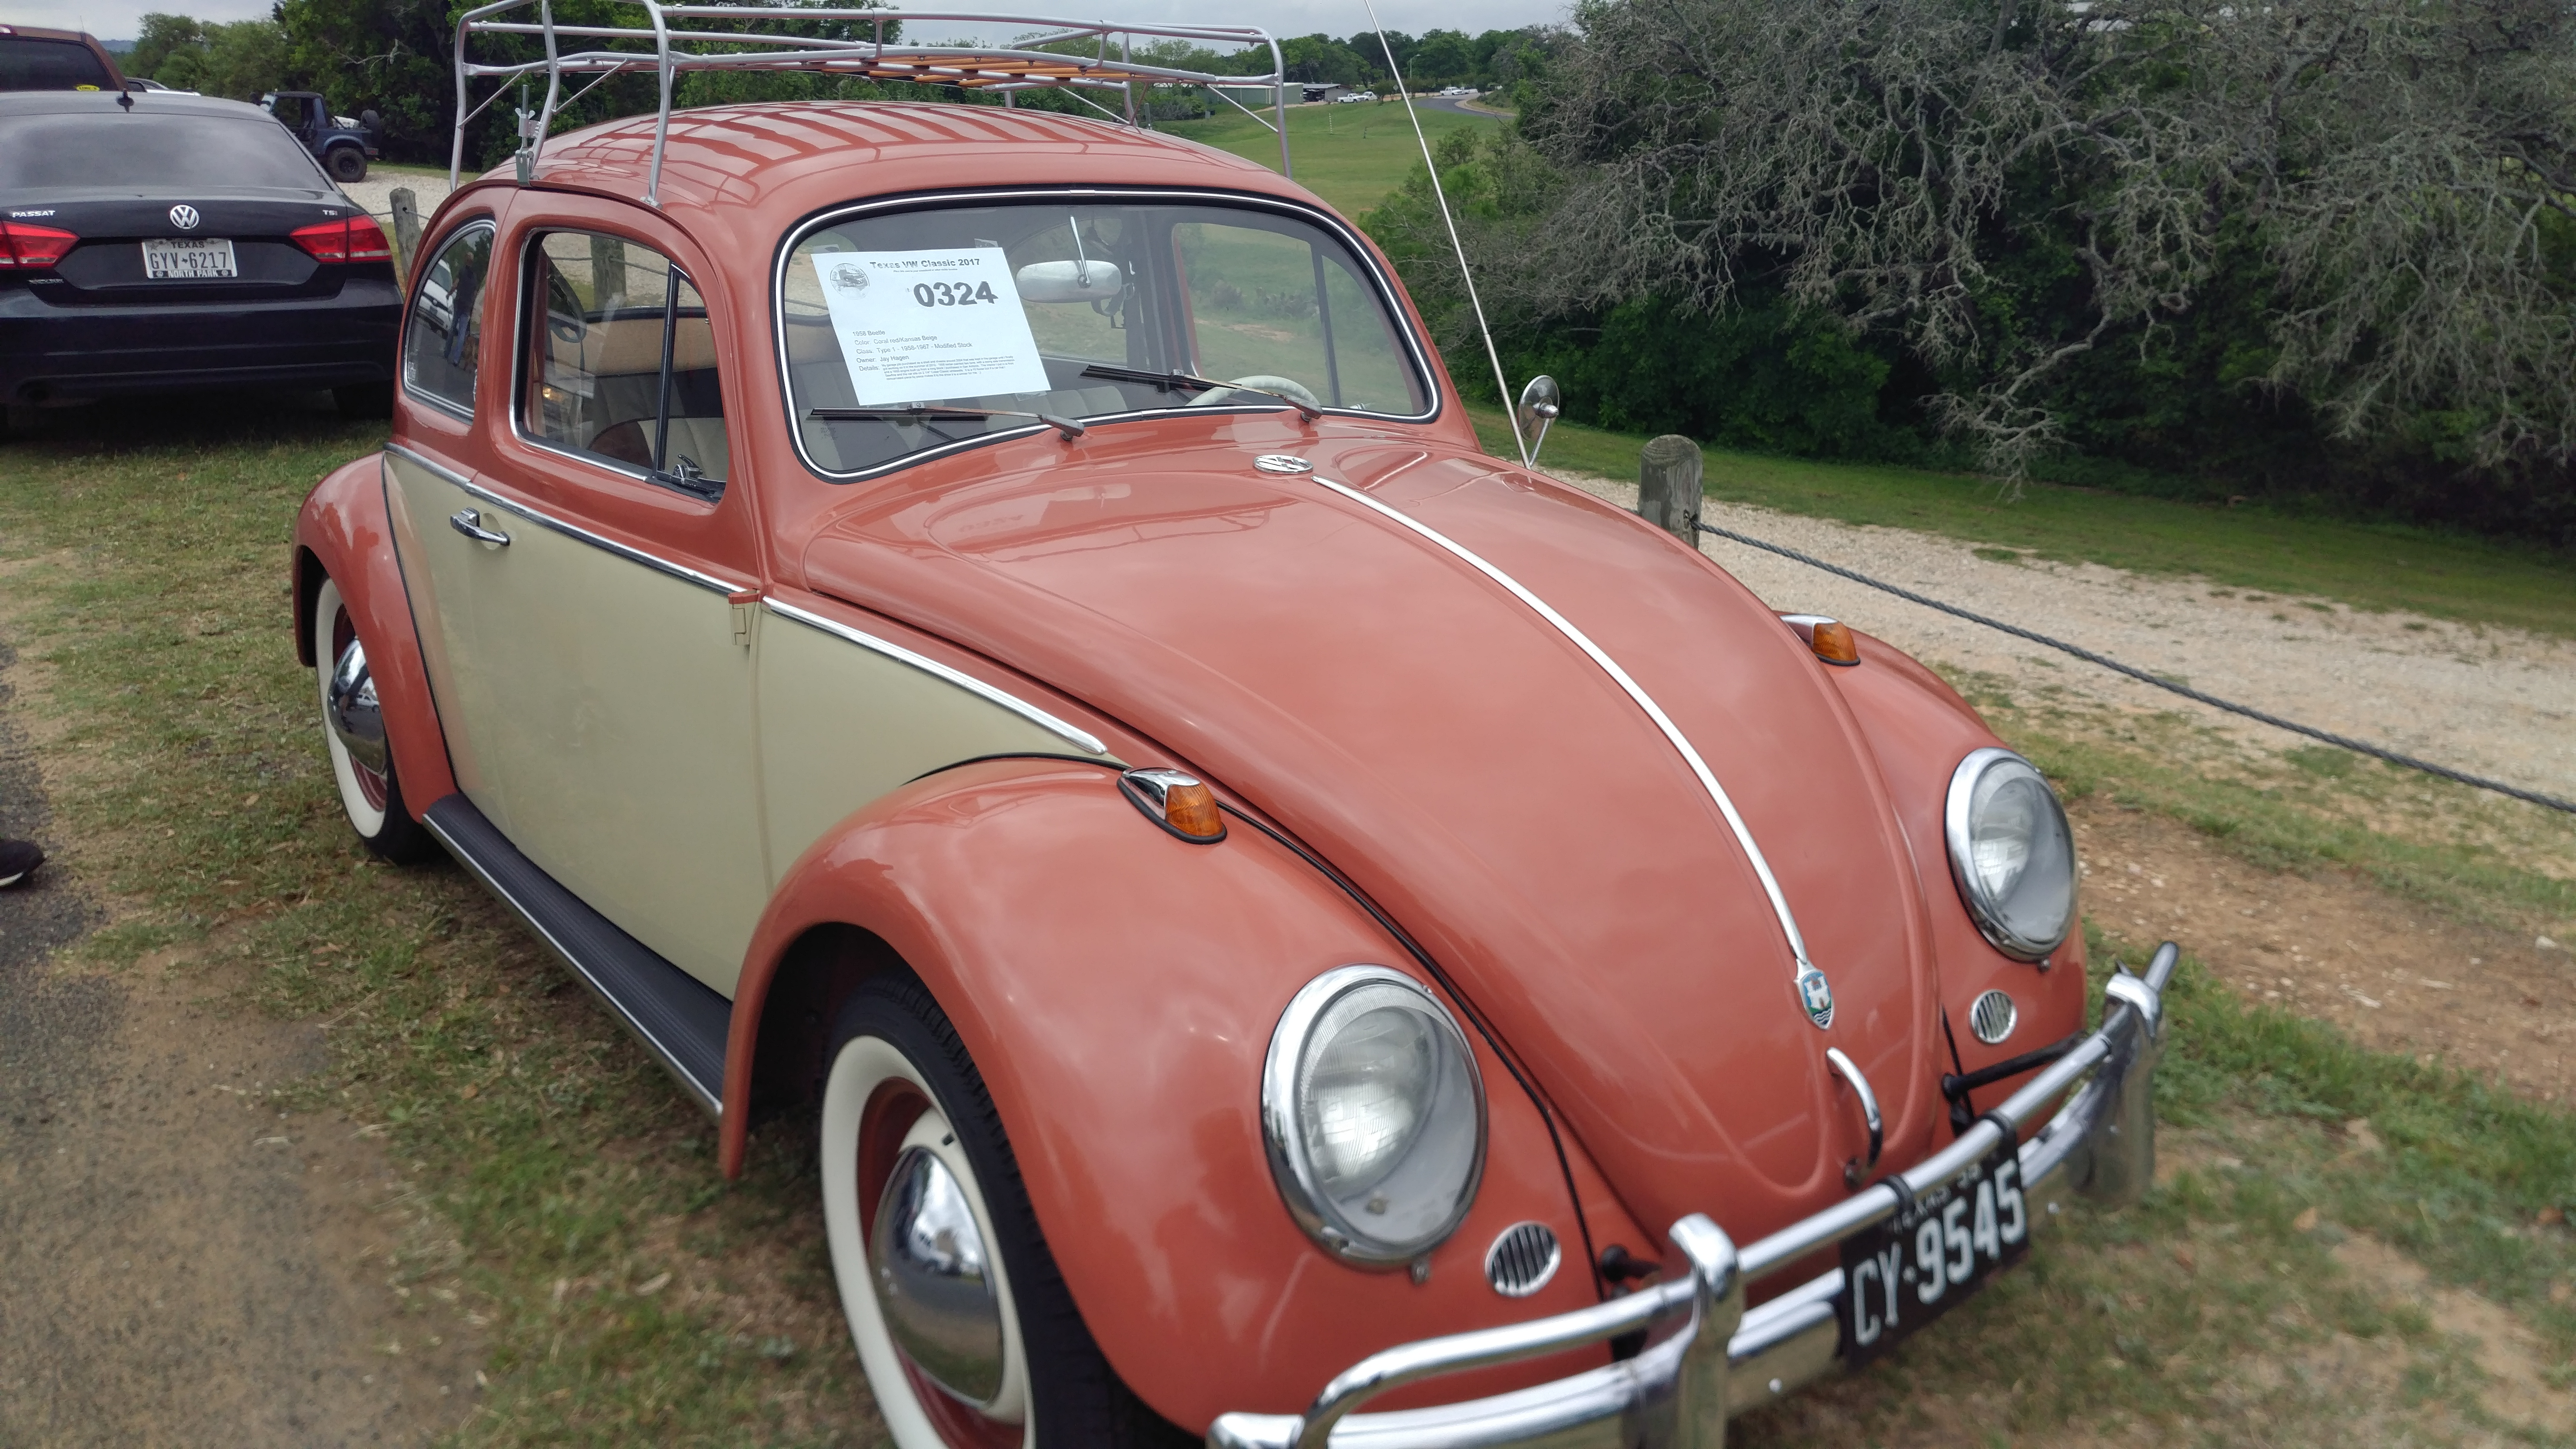 0324 - Texas VW Classic